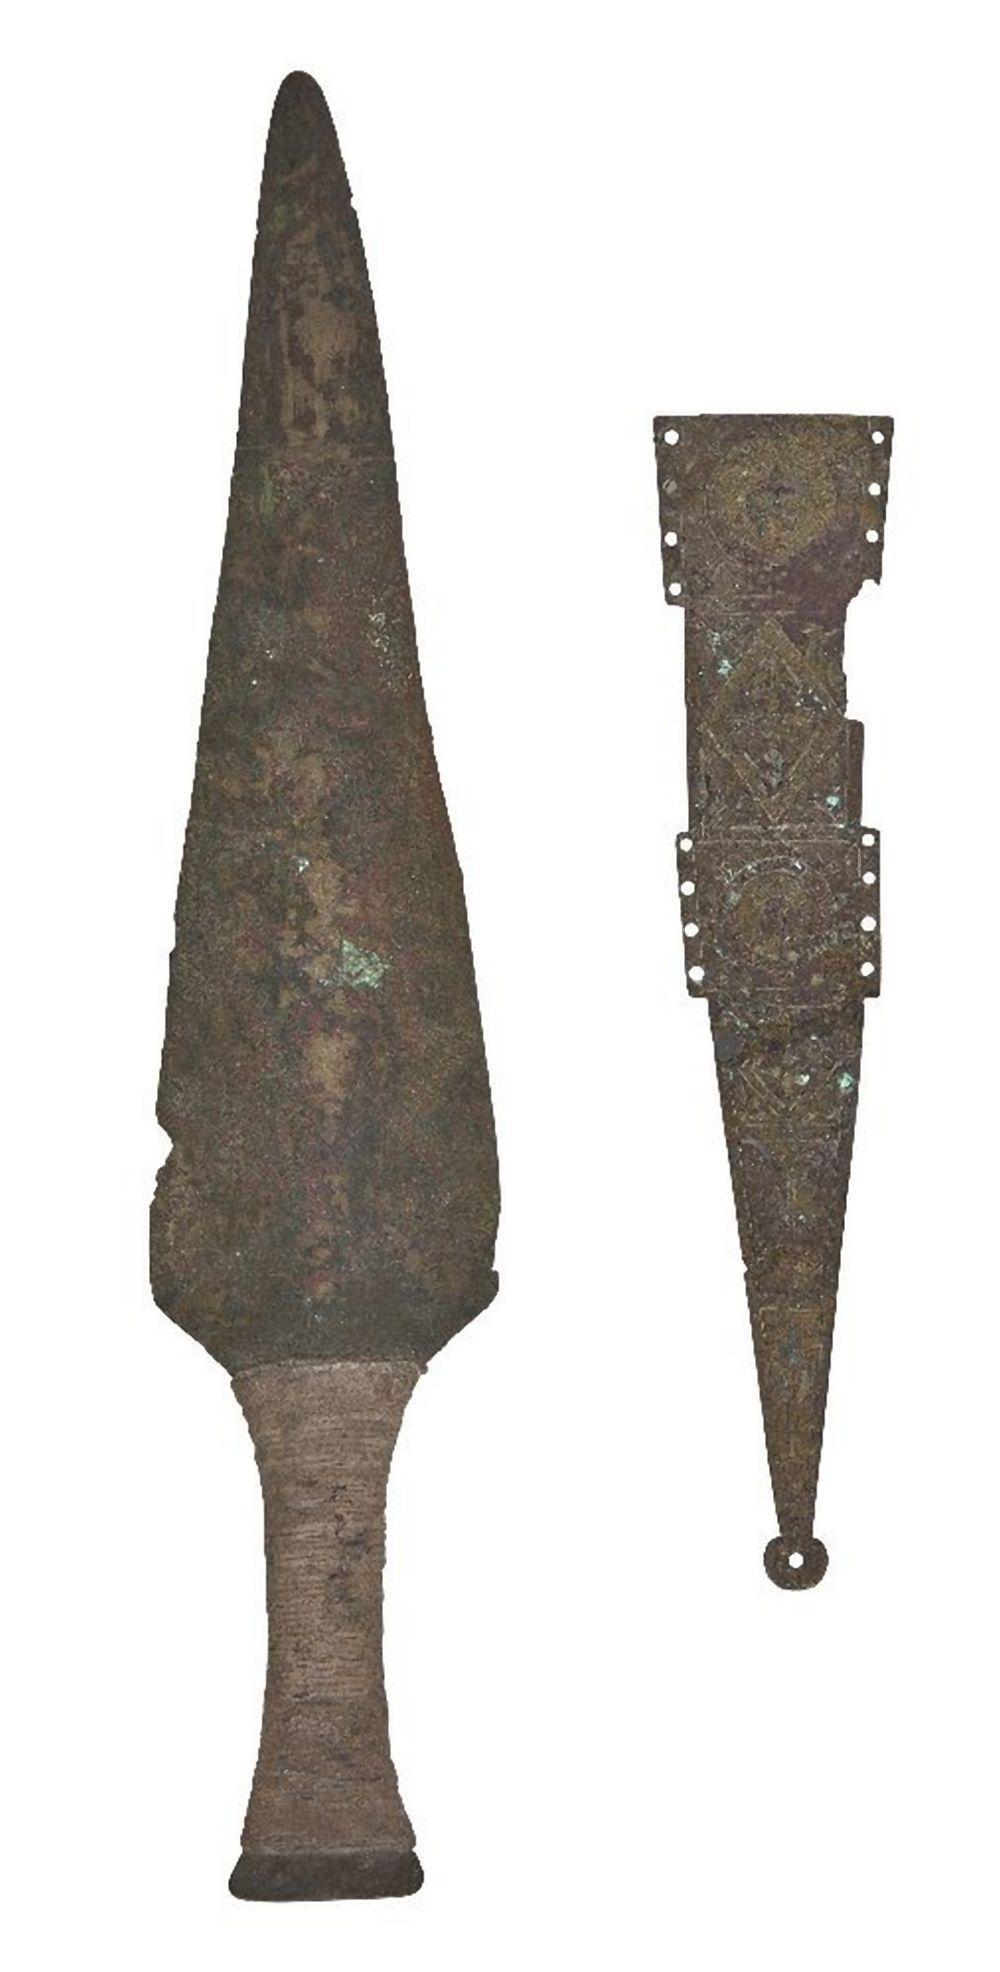 A Roman bronze dagger sheath element, circa 1st century A.D., with the prin